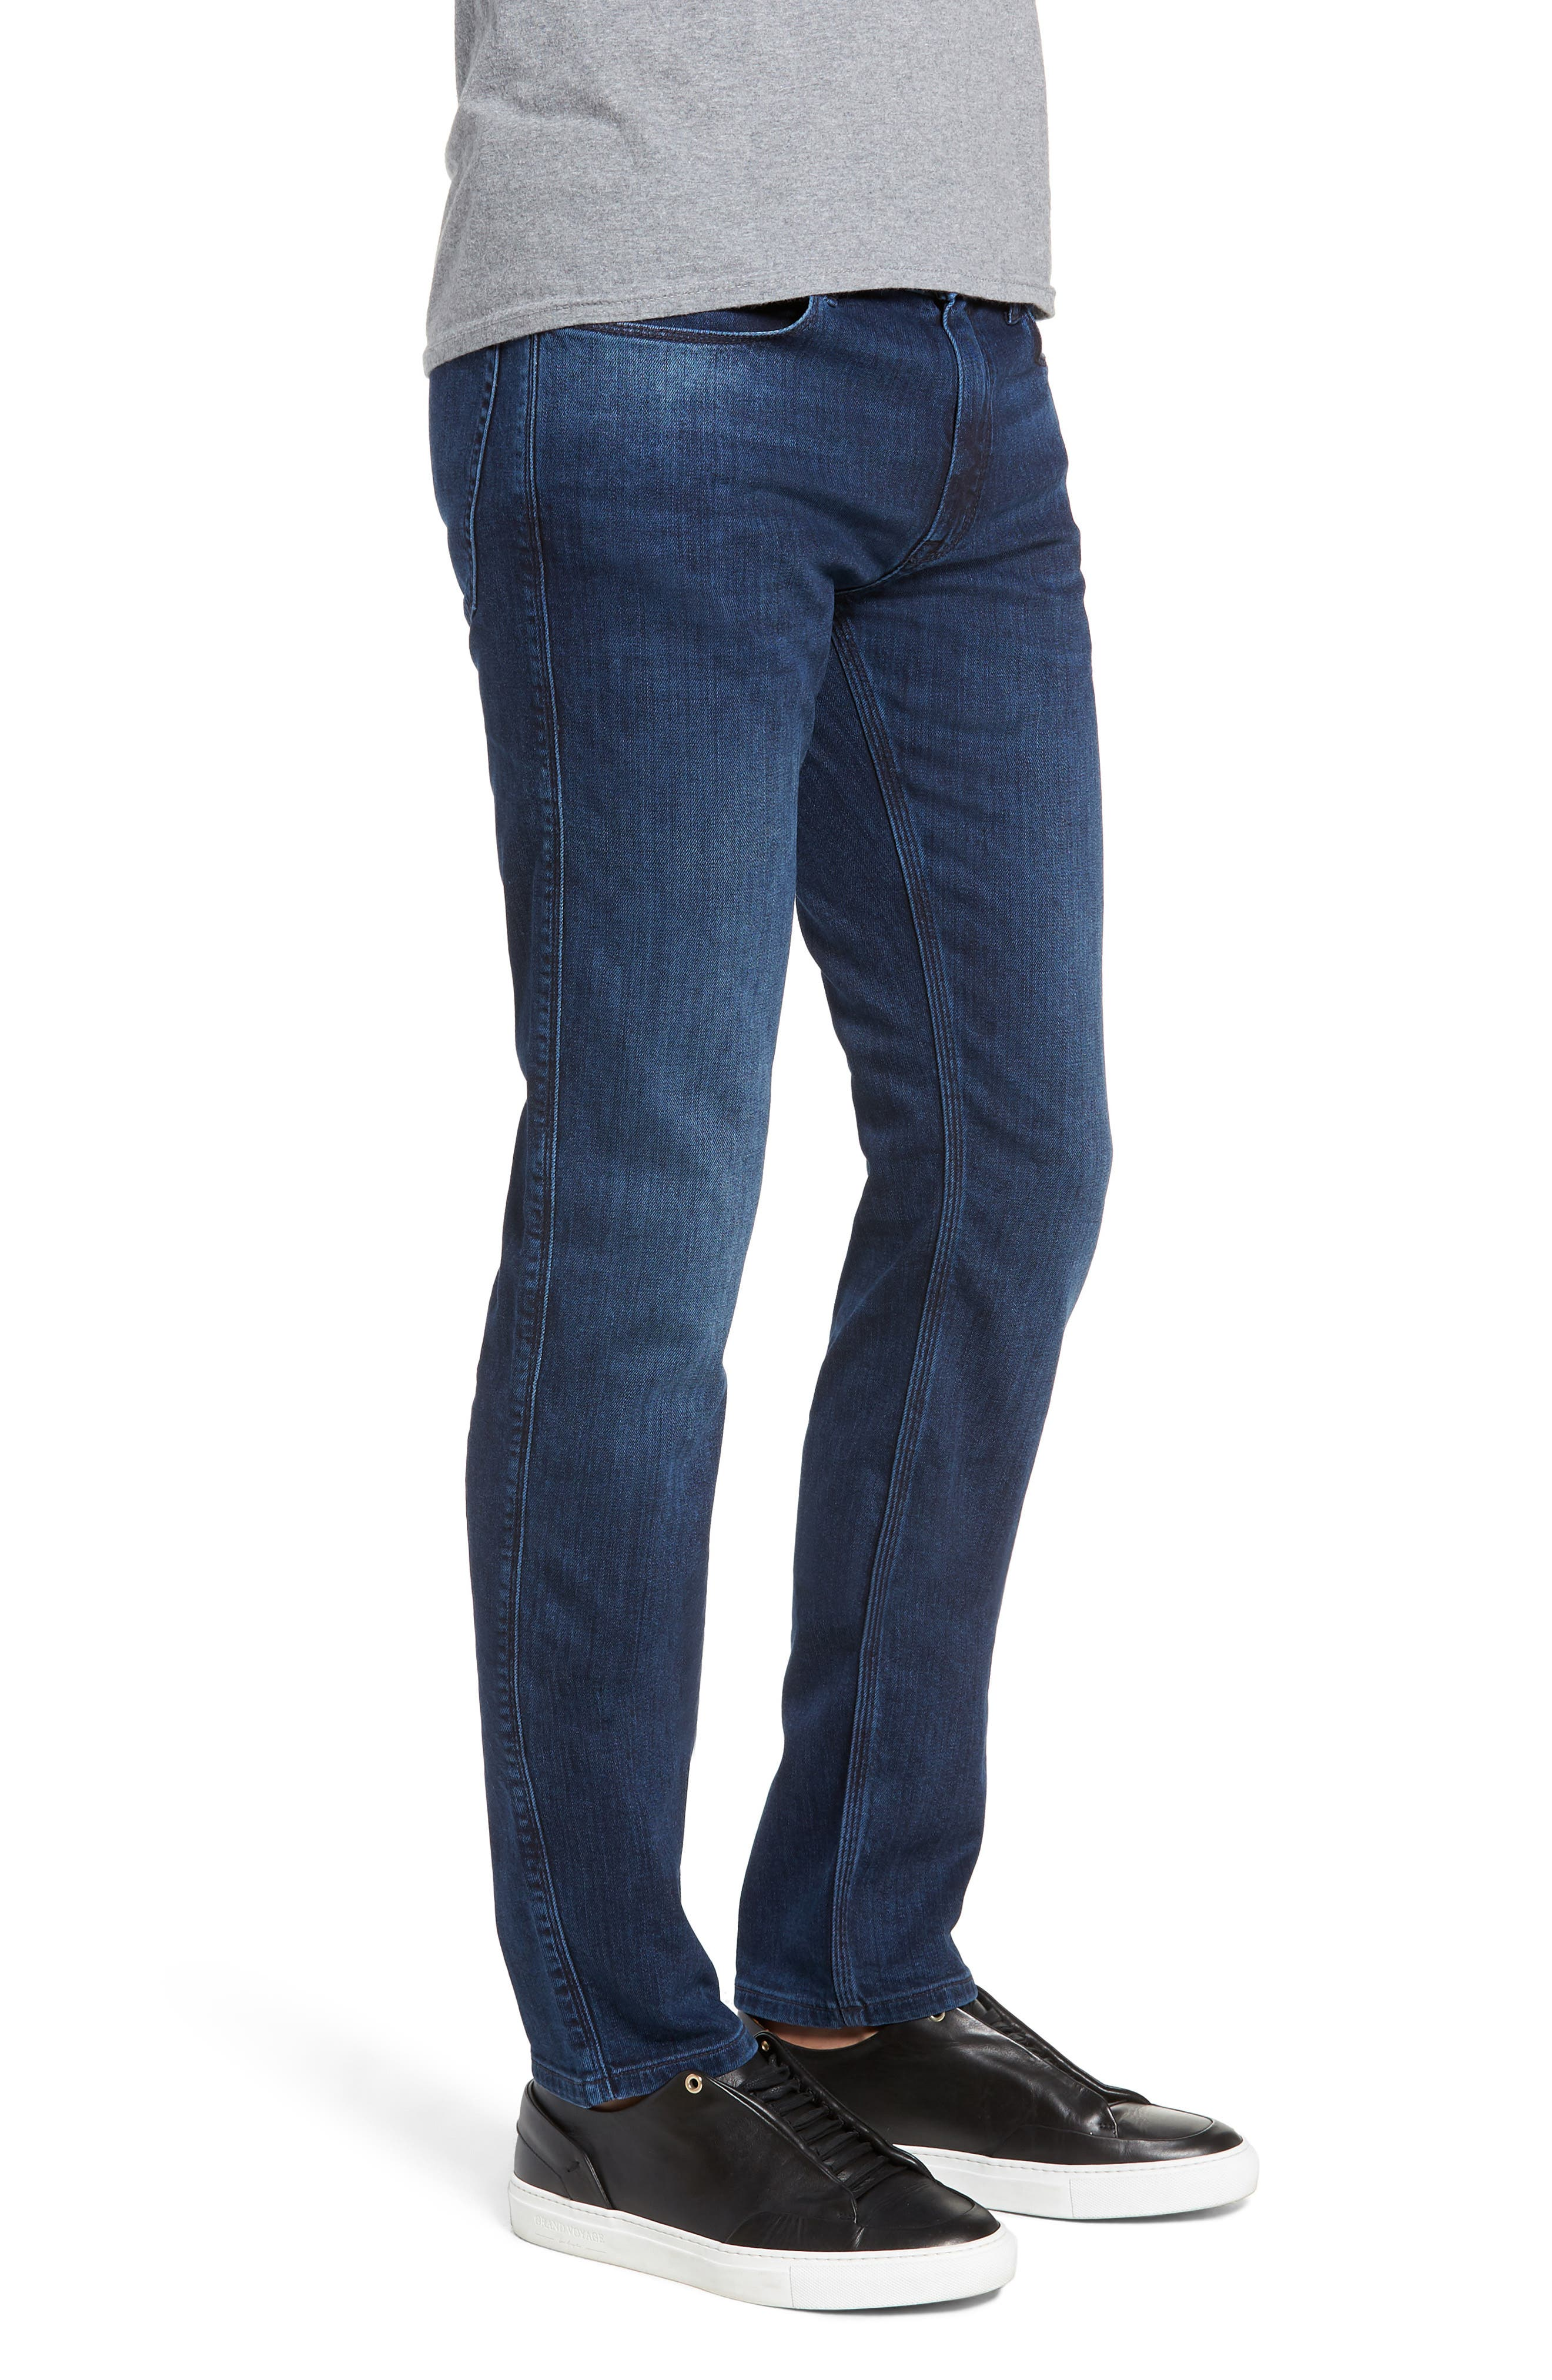 708 Stretch Slim Fit Jeans,                             Alternate thumbnail 3, color,                             BLUE